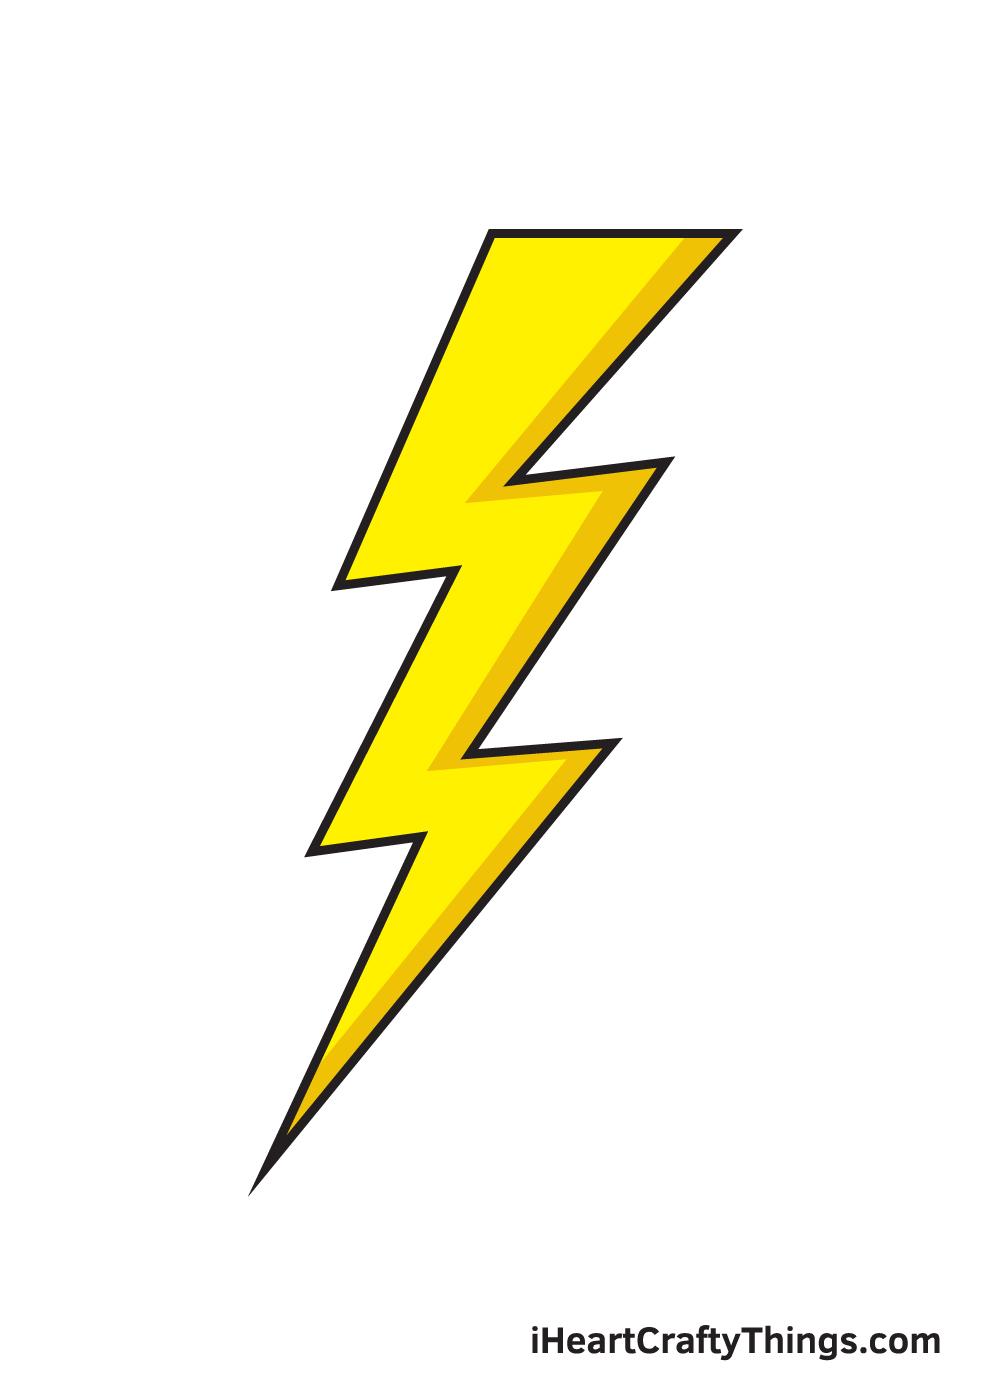 lightning bolt drawing 9 steps